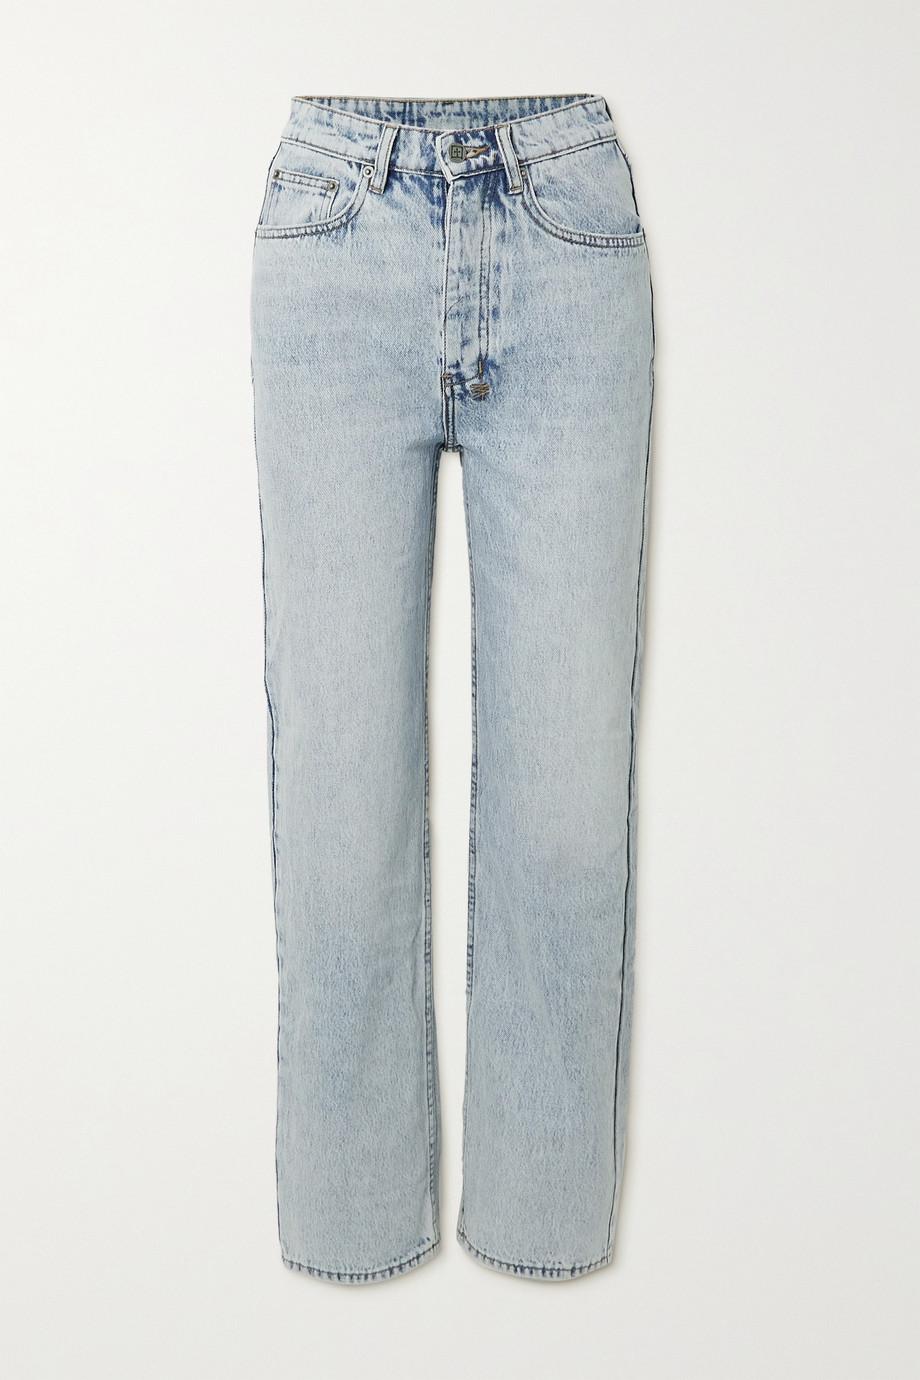 Ksubi Brooklyn high-rise straight-leg jeans